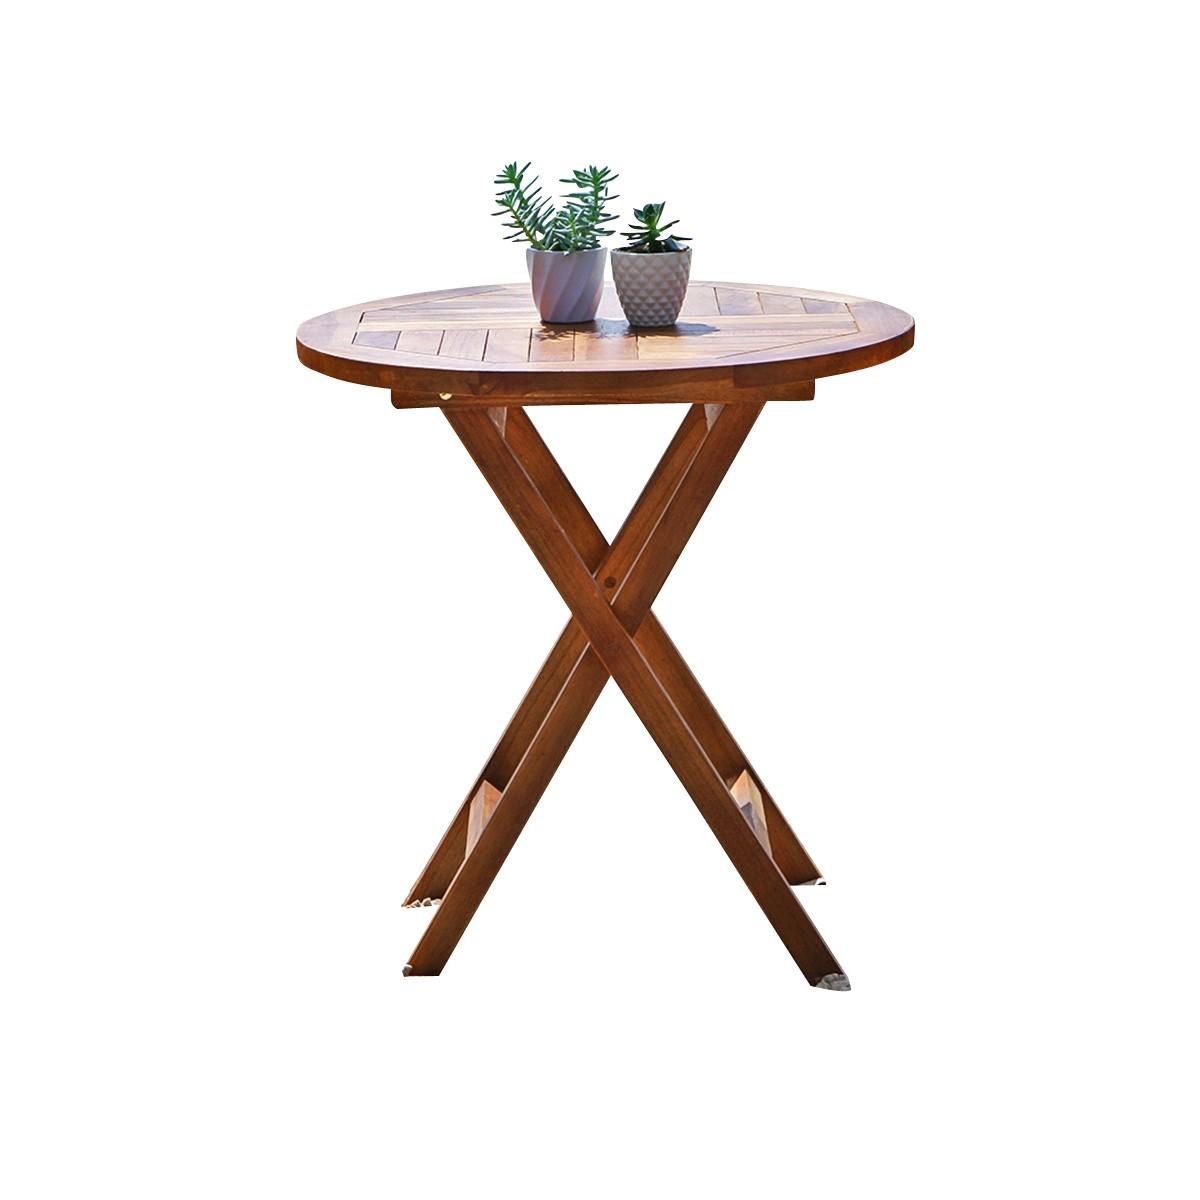 Table de jardin ronde en teck huilé 4 personnes